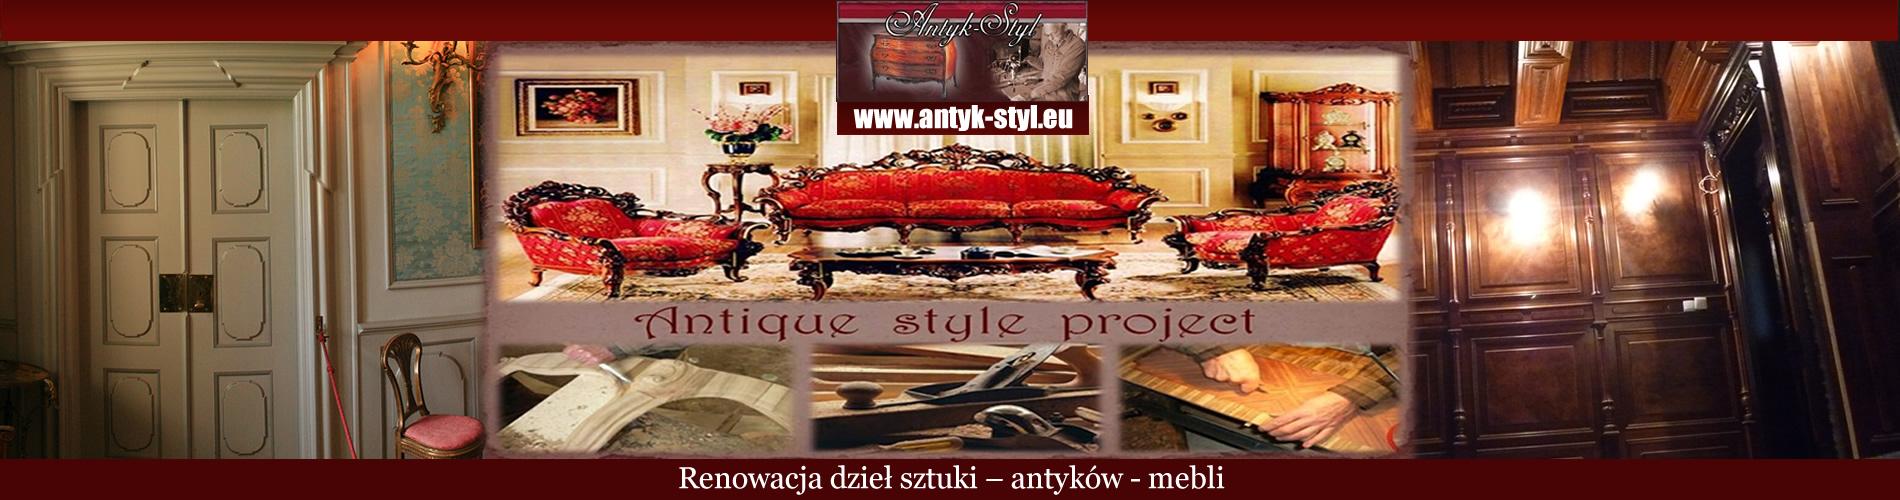 groupvip.pl